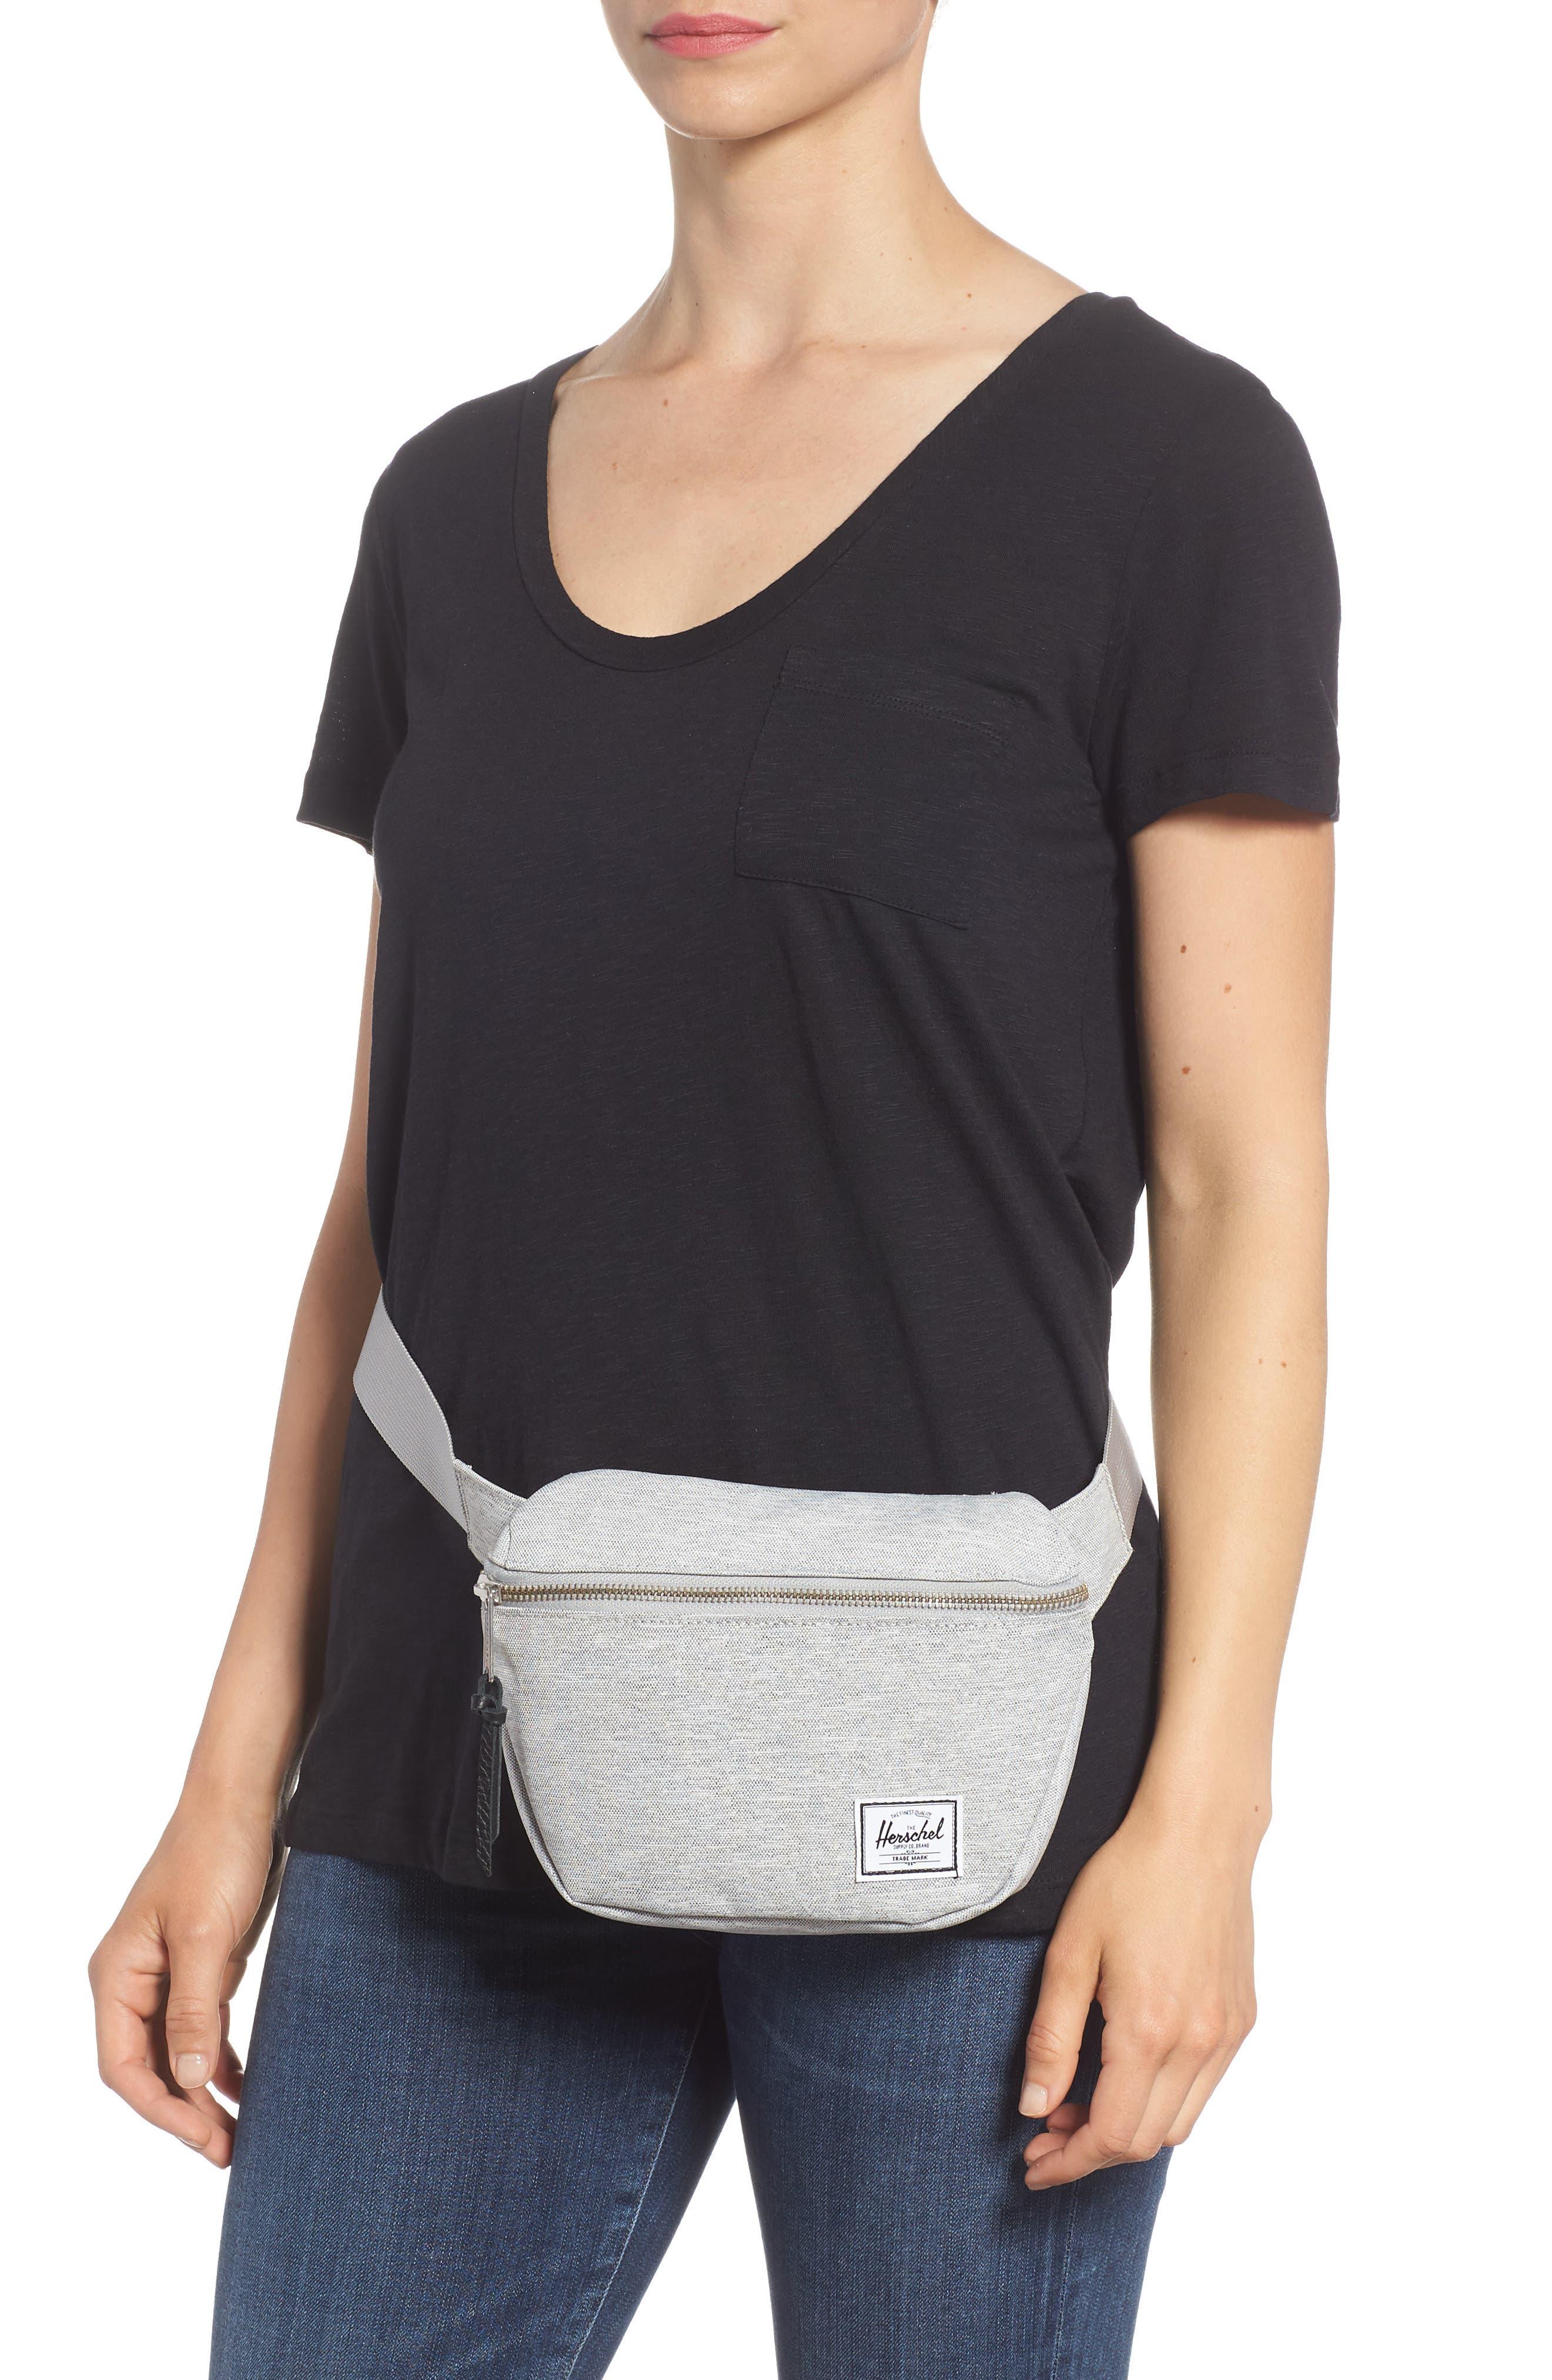 Fifteen Belt Bag,                             Alternate thumbnail 3, color,                             Light Grey